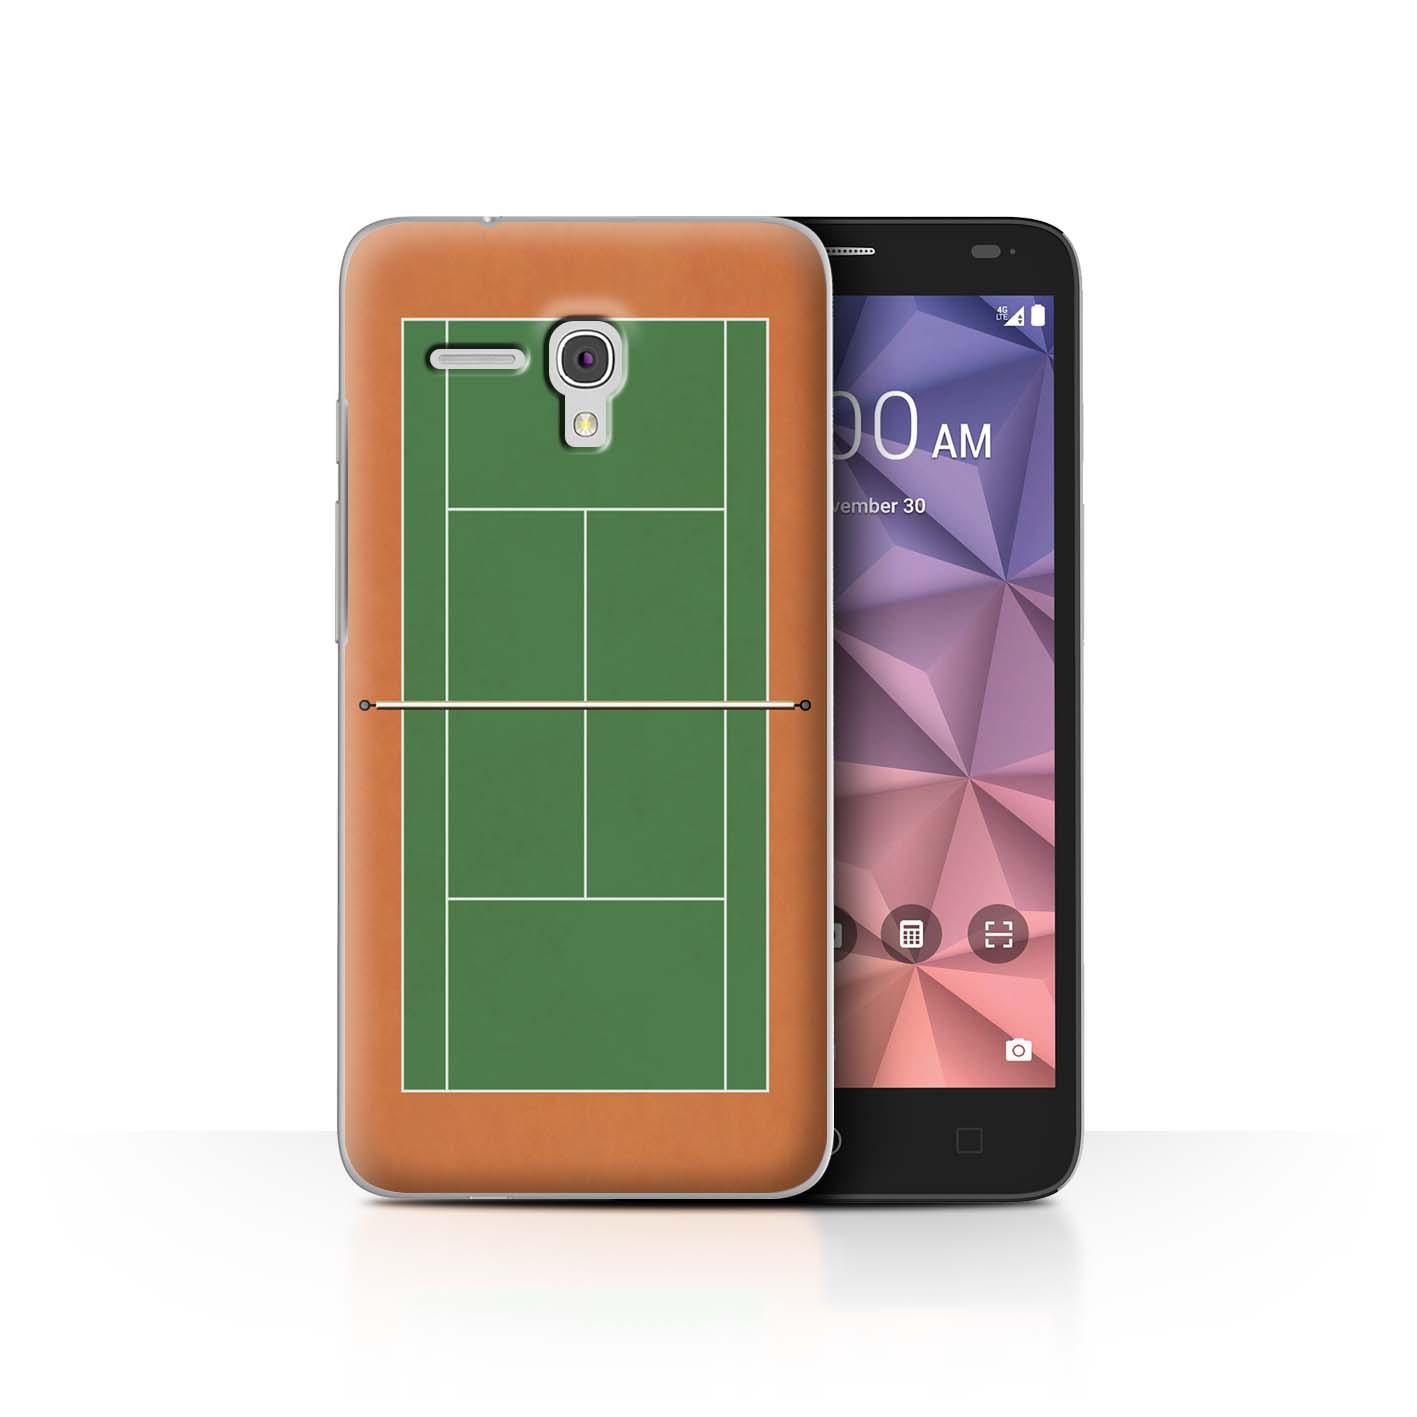 STUFF4-Back-Case-Cover-Skin-for-Alcatel-Fierce-XL-Tennis-Courts